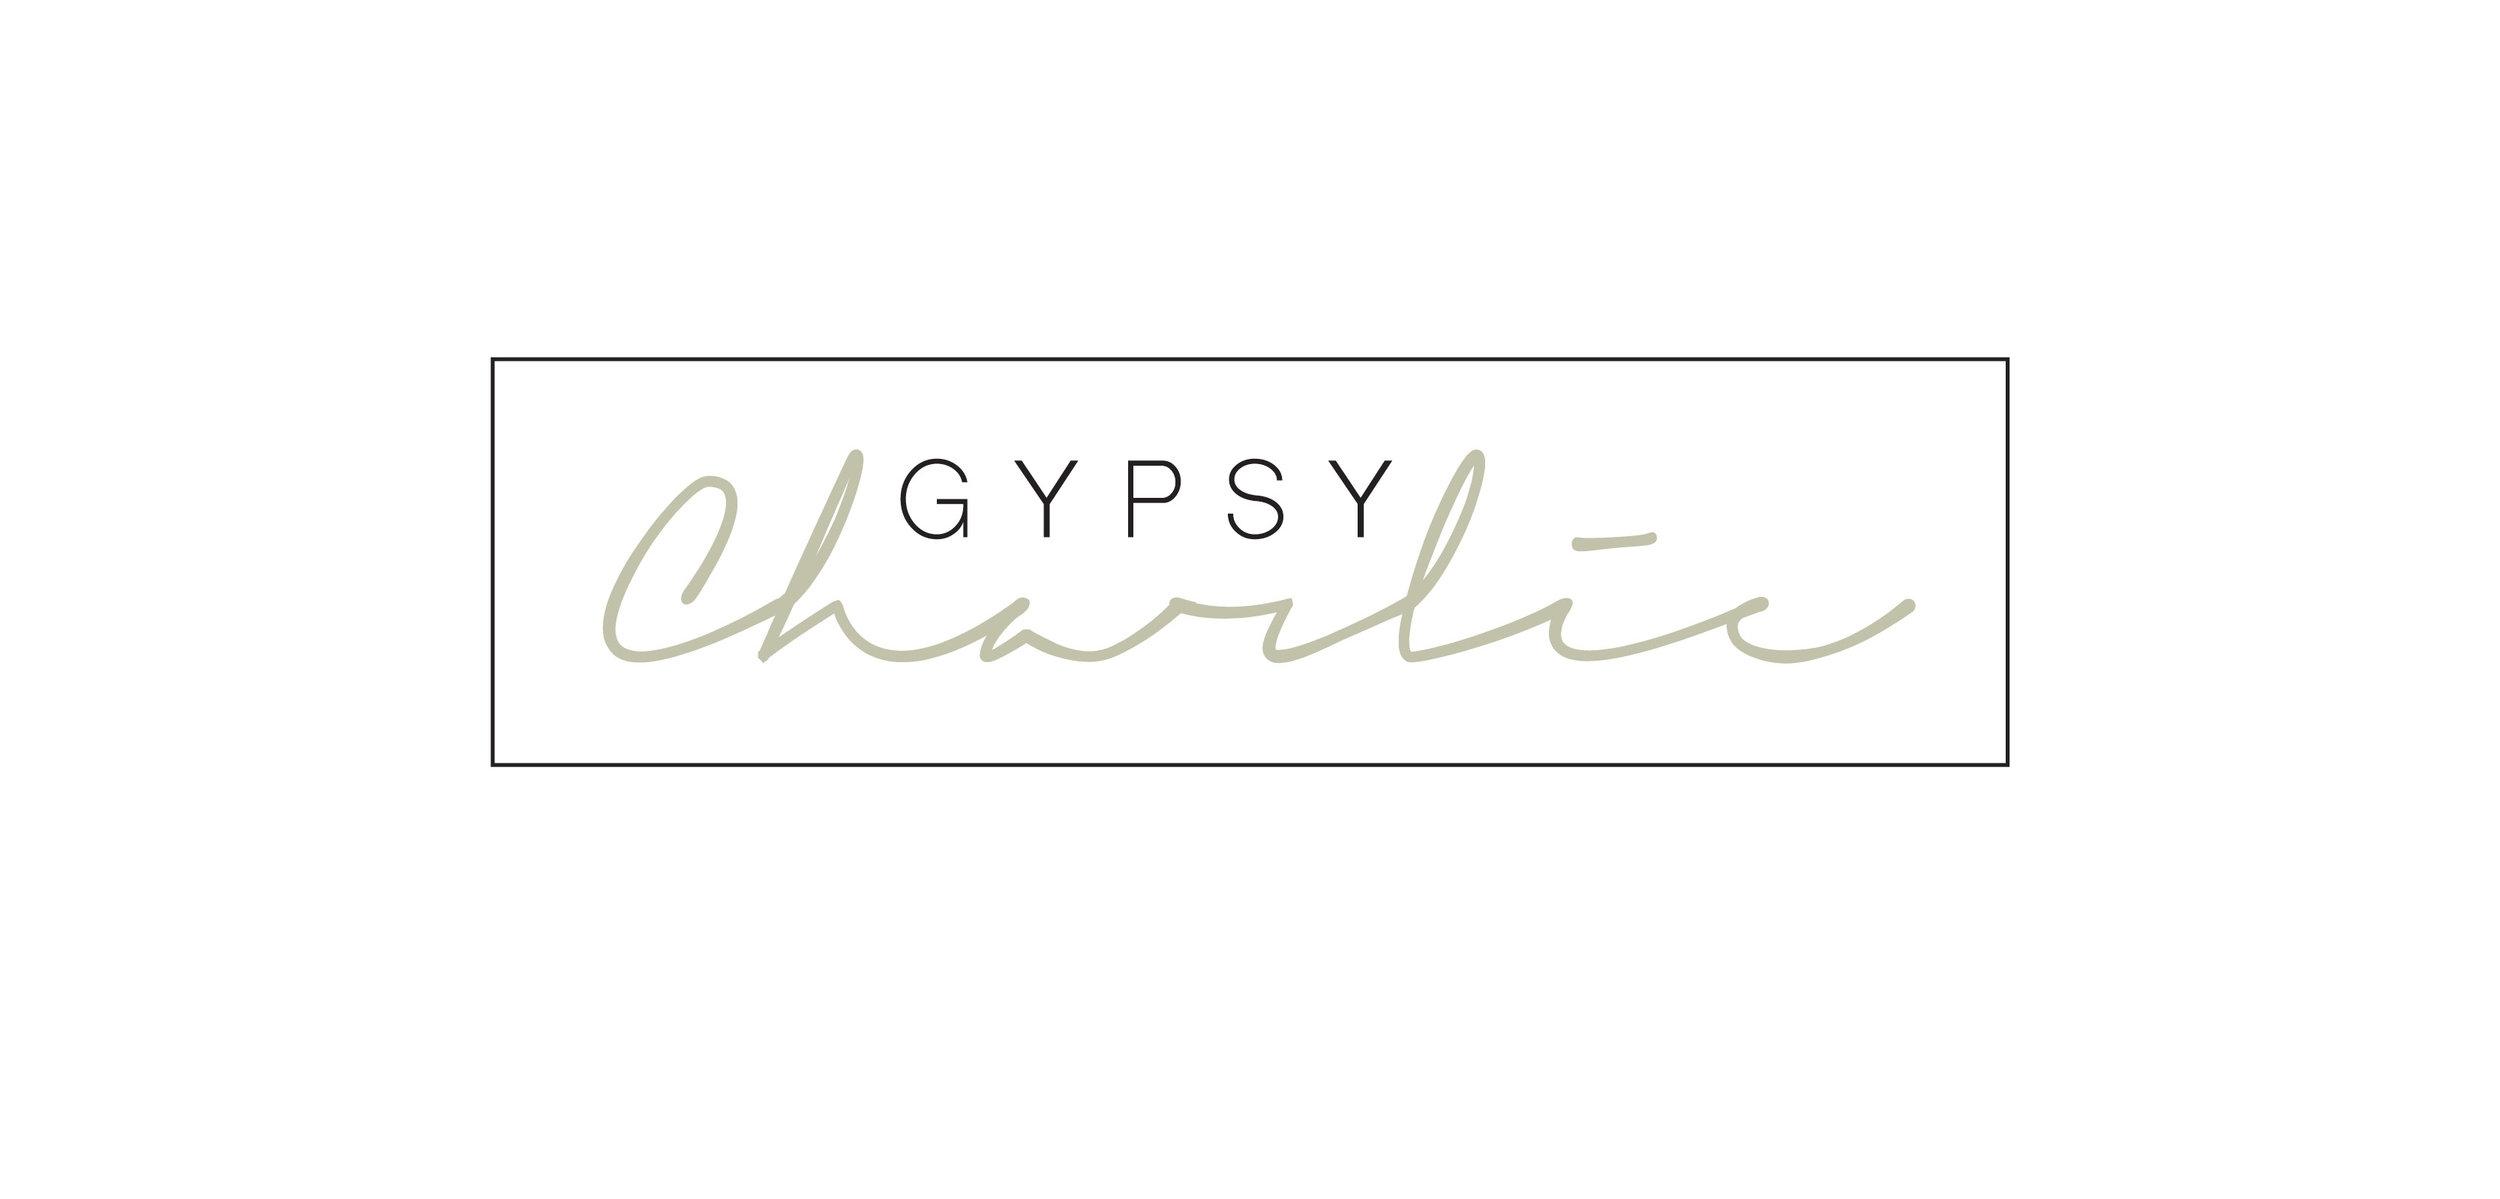 GypsyCharlie-Brand2.jpg